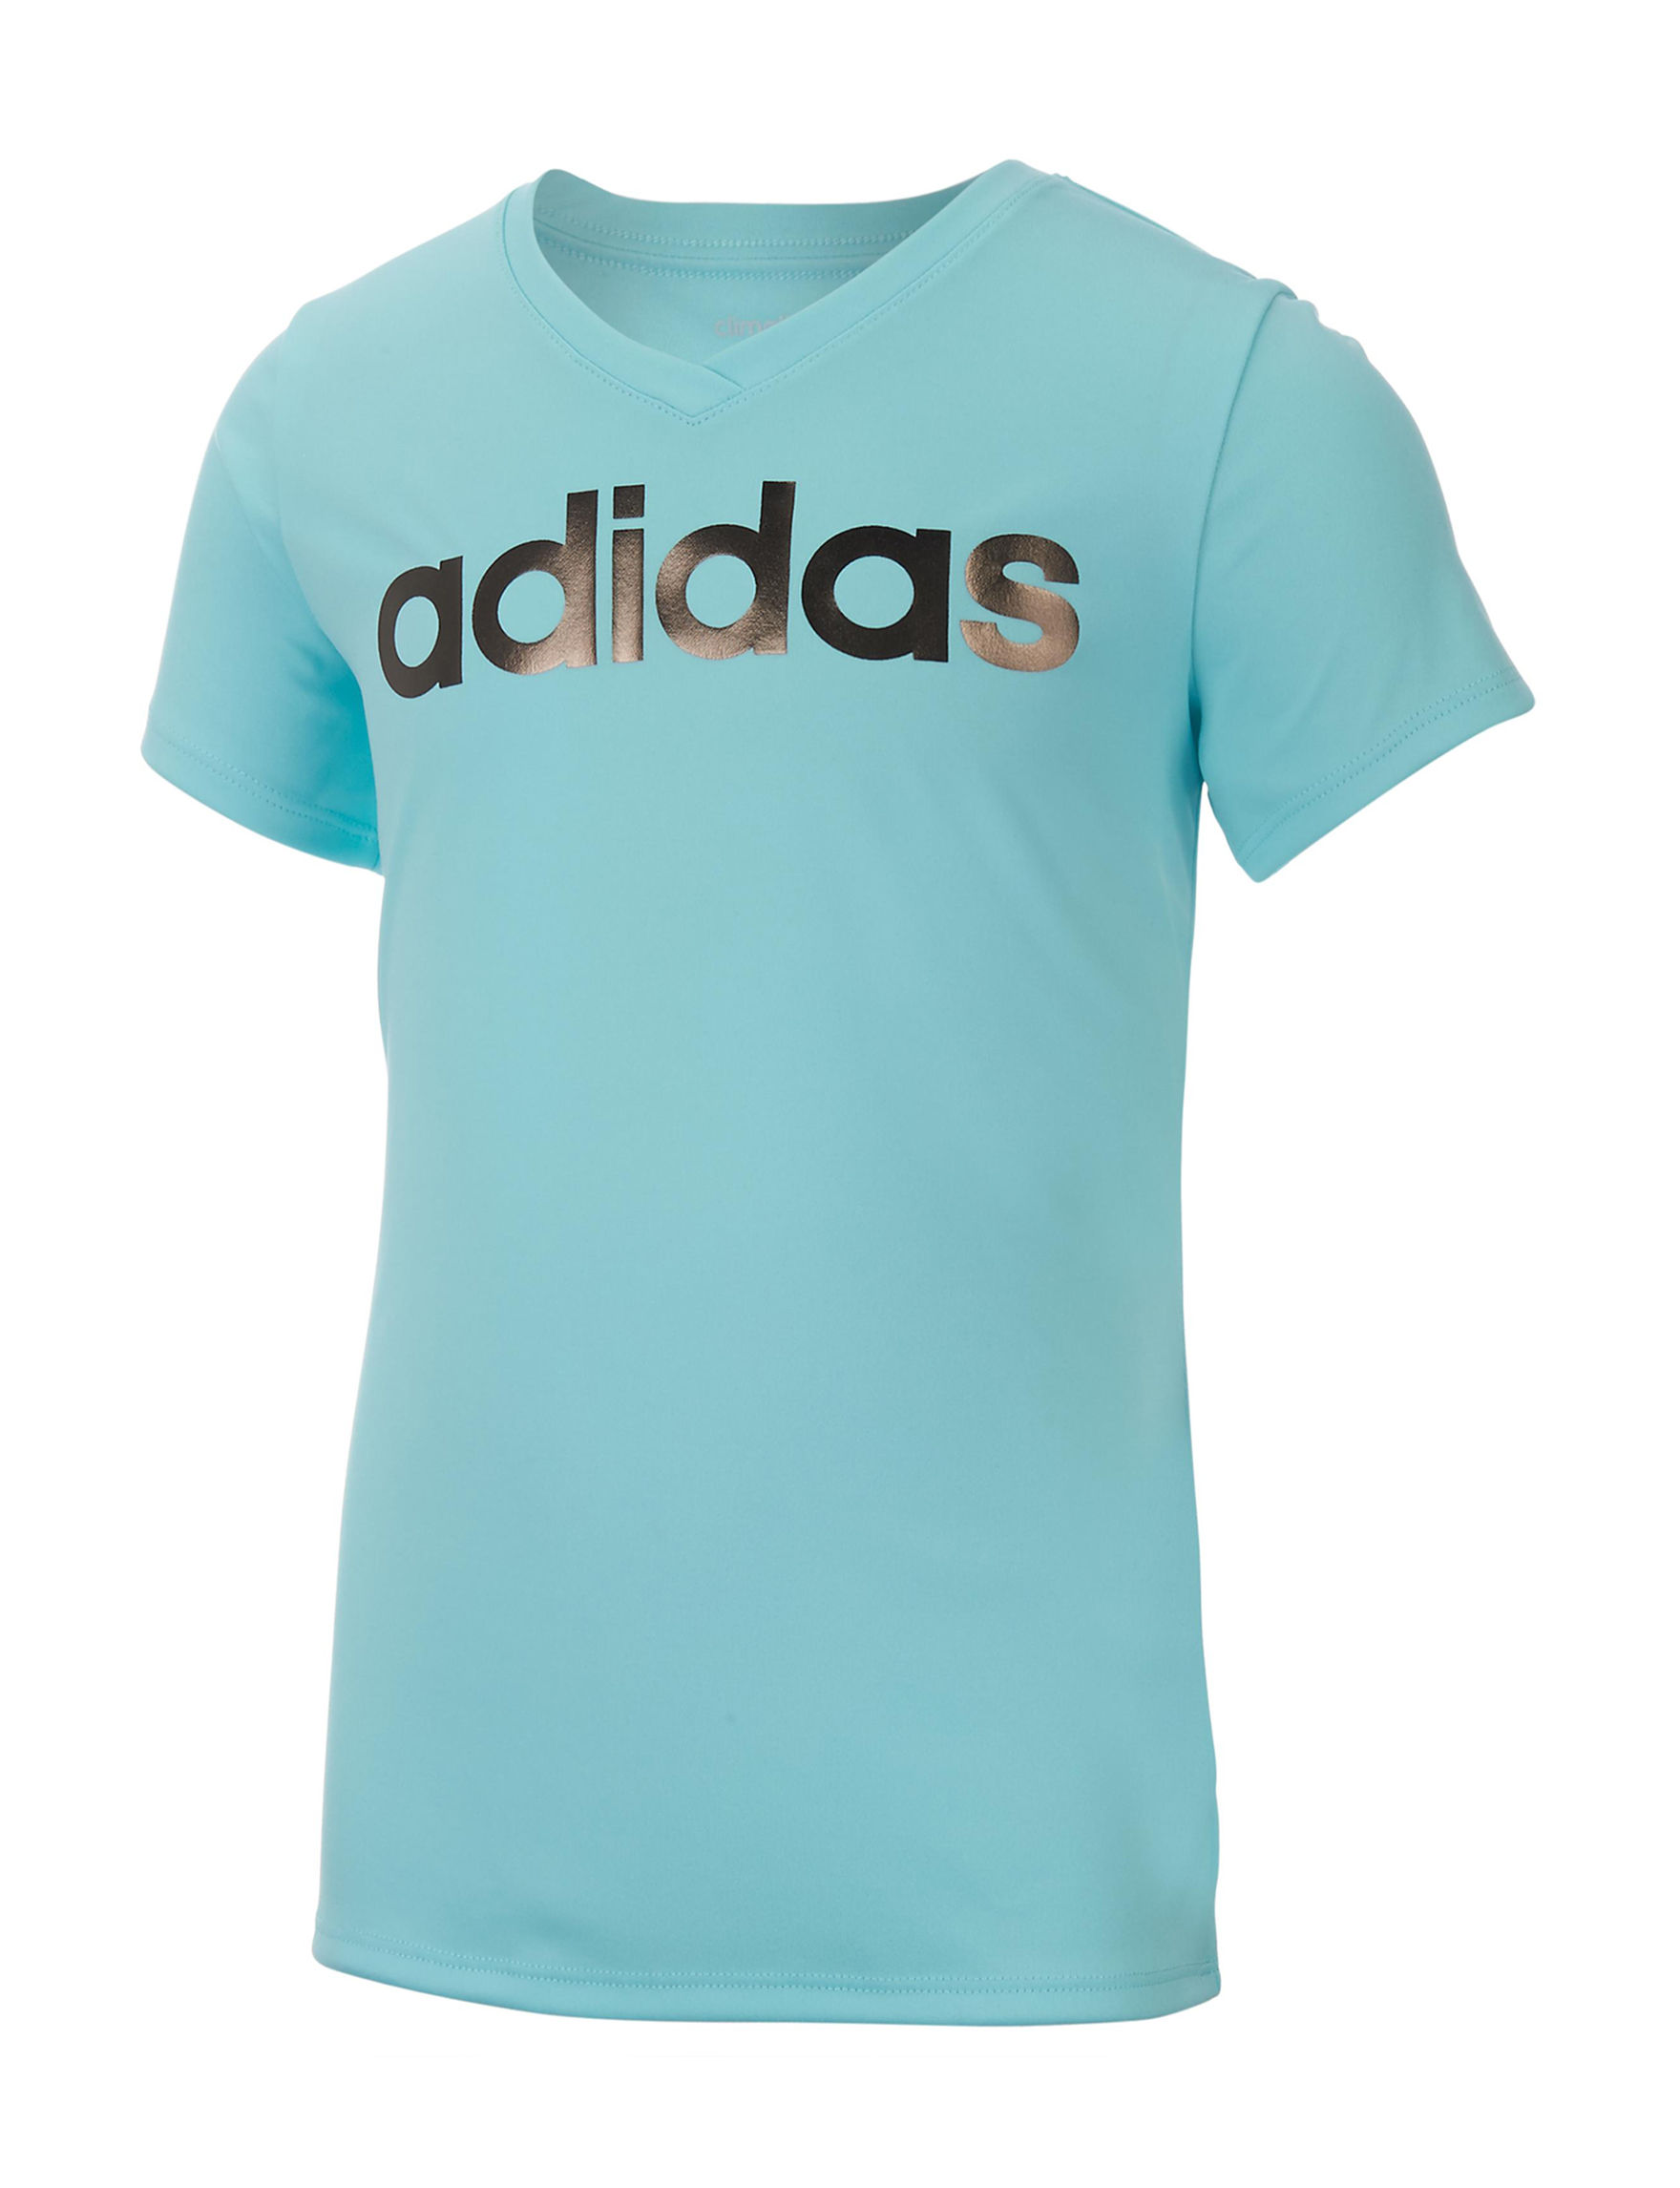 Adidas Aqua